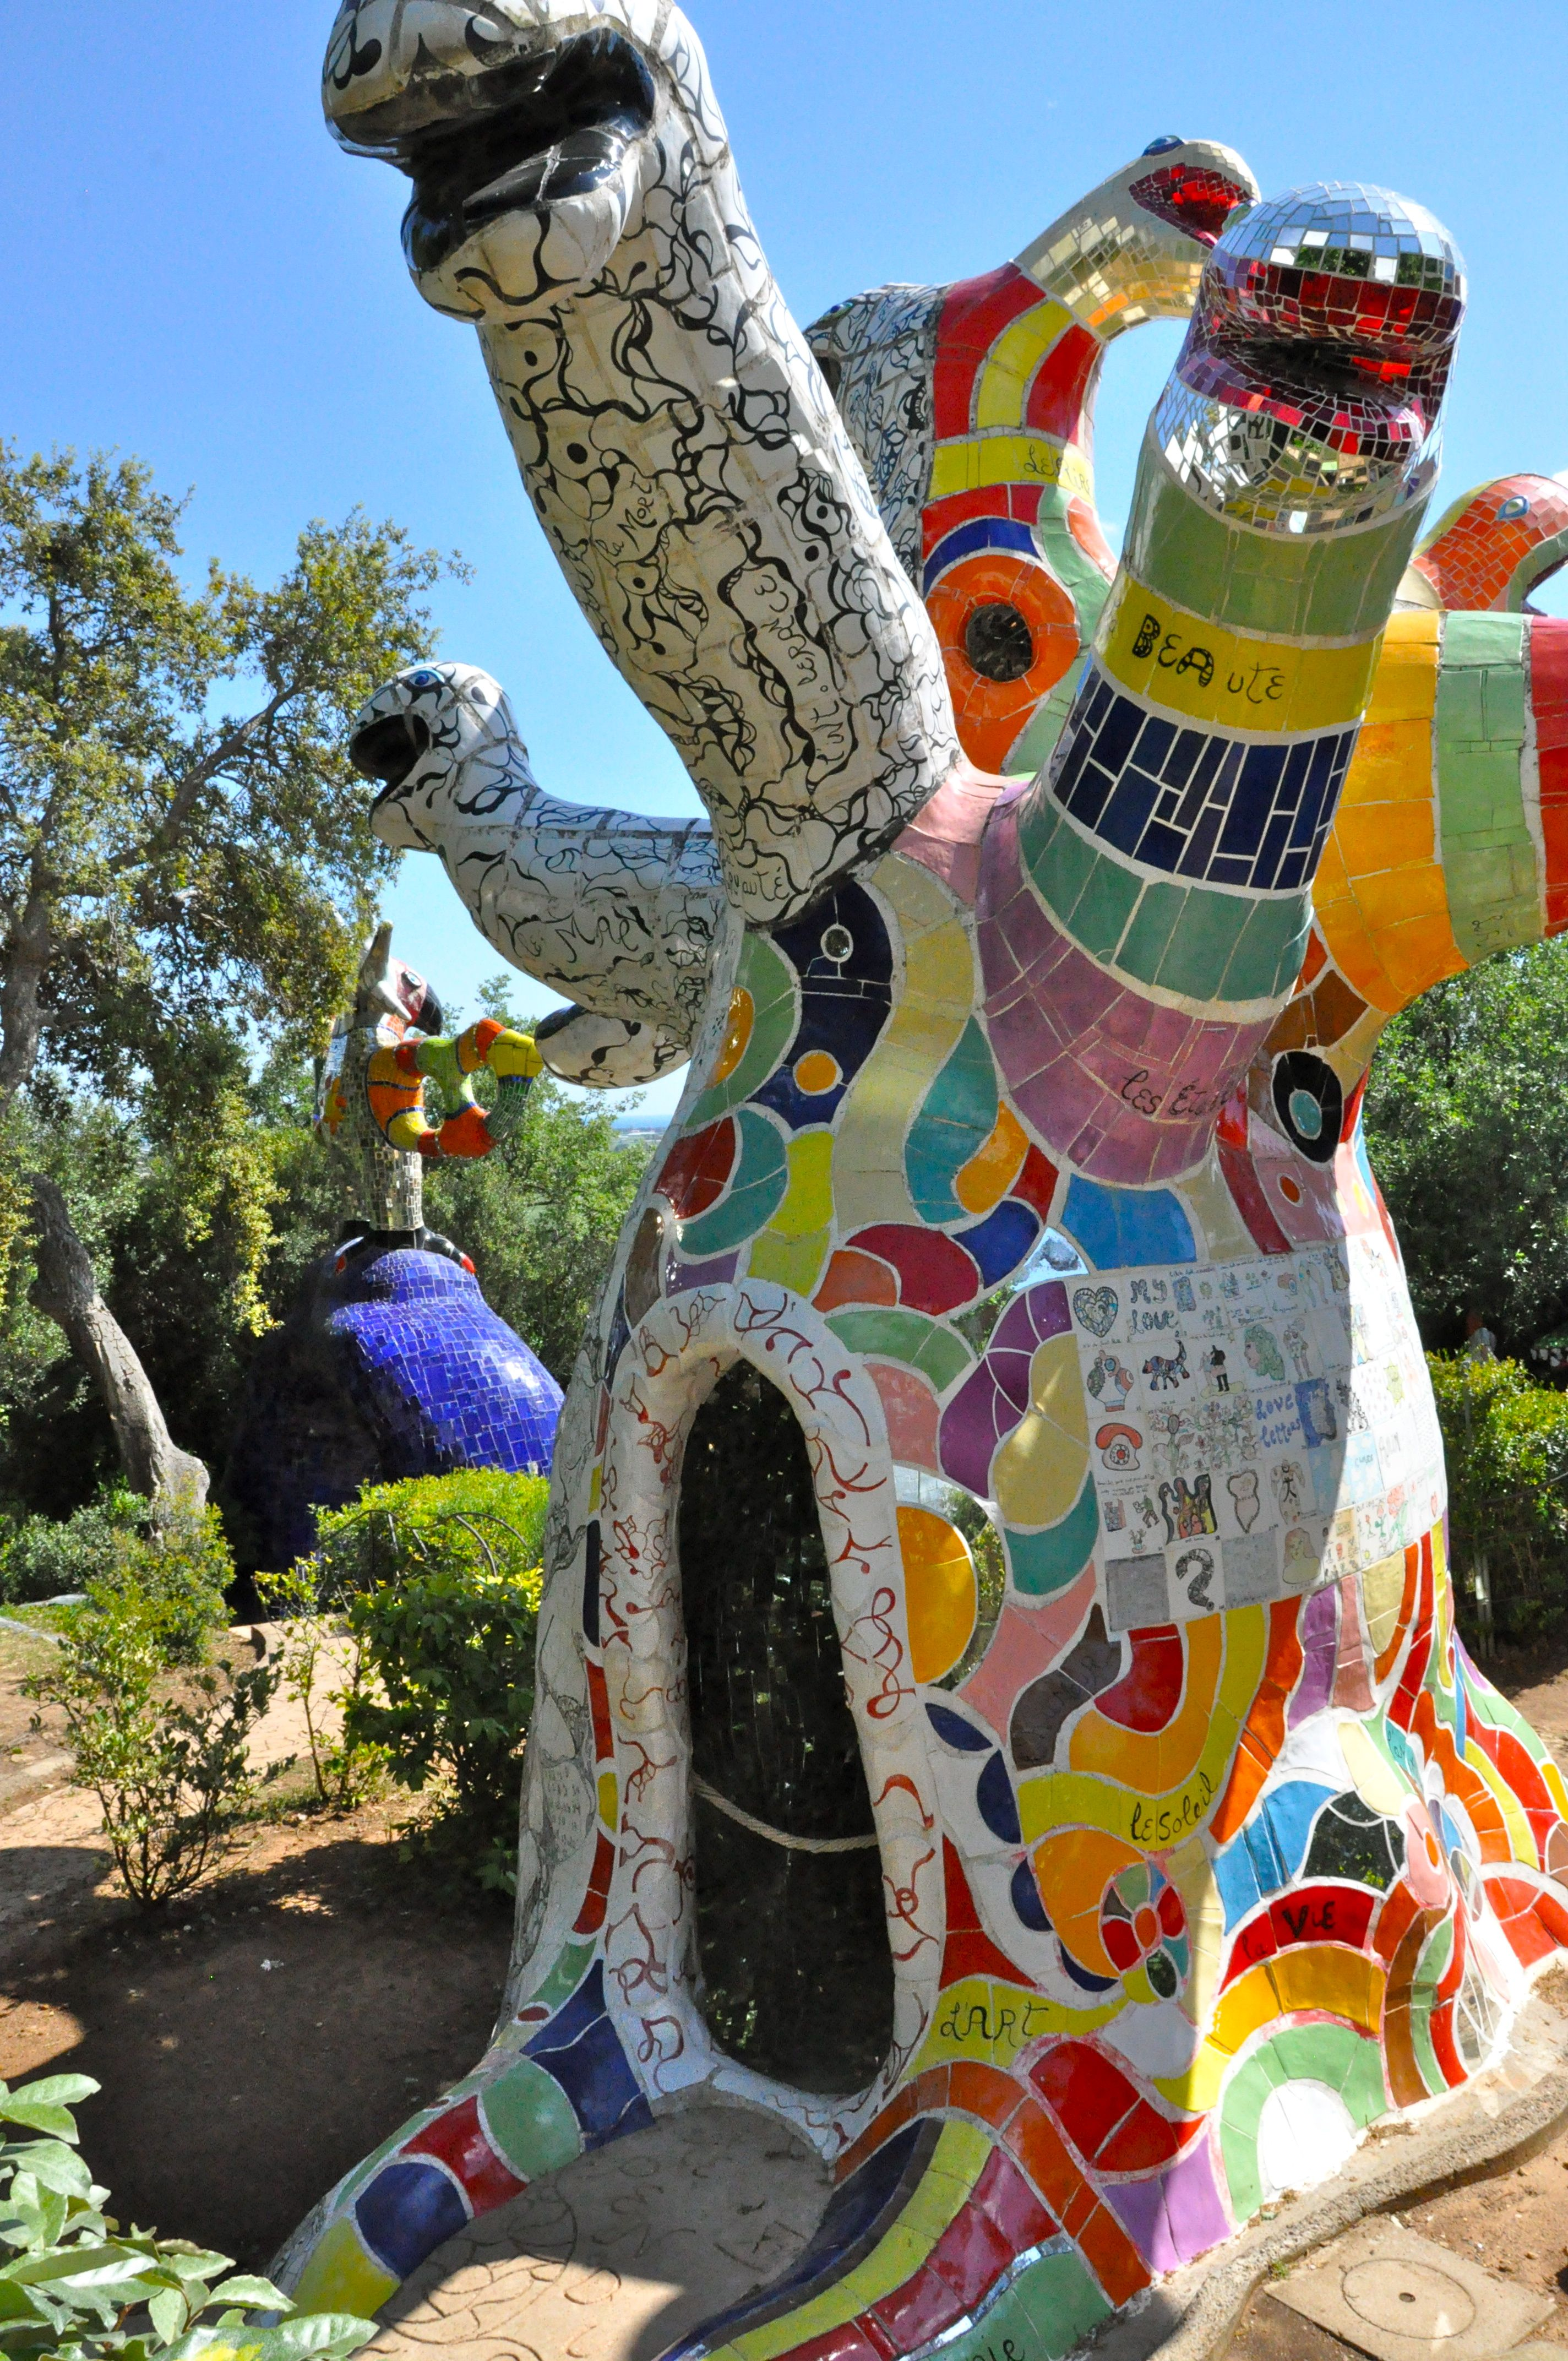 Nicki de saint phalle tarotgarden tuscany art foto - Jardin tarots niki de saint phalle ...